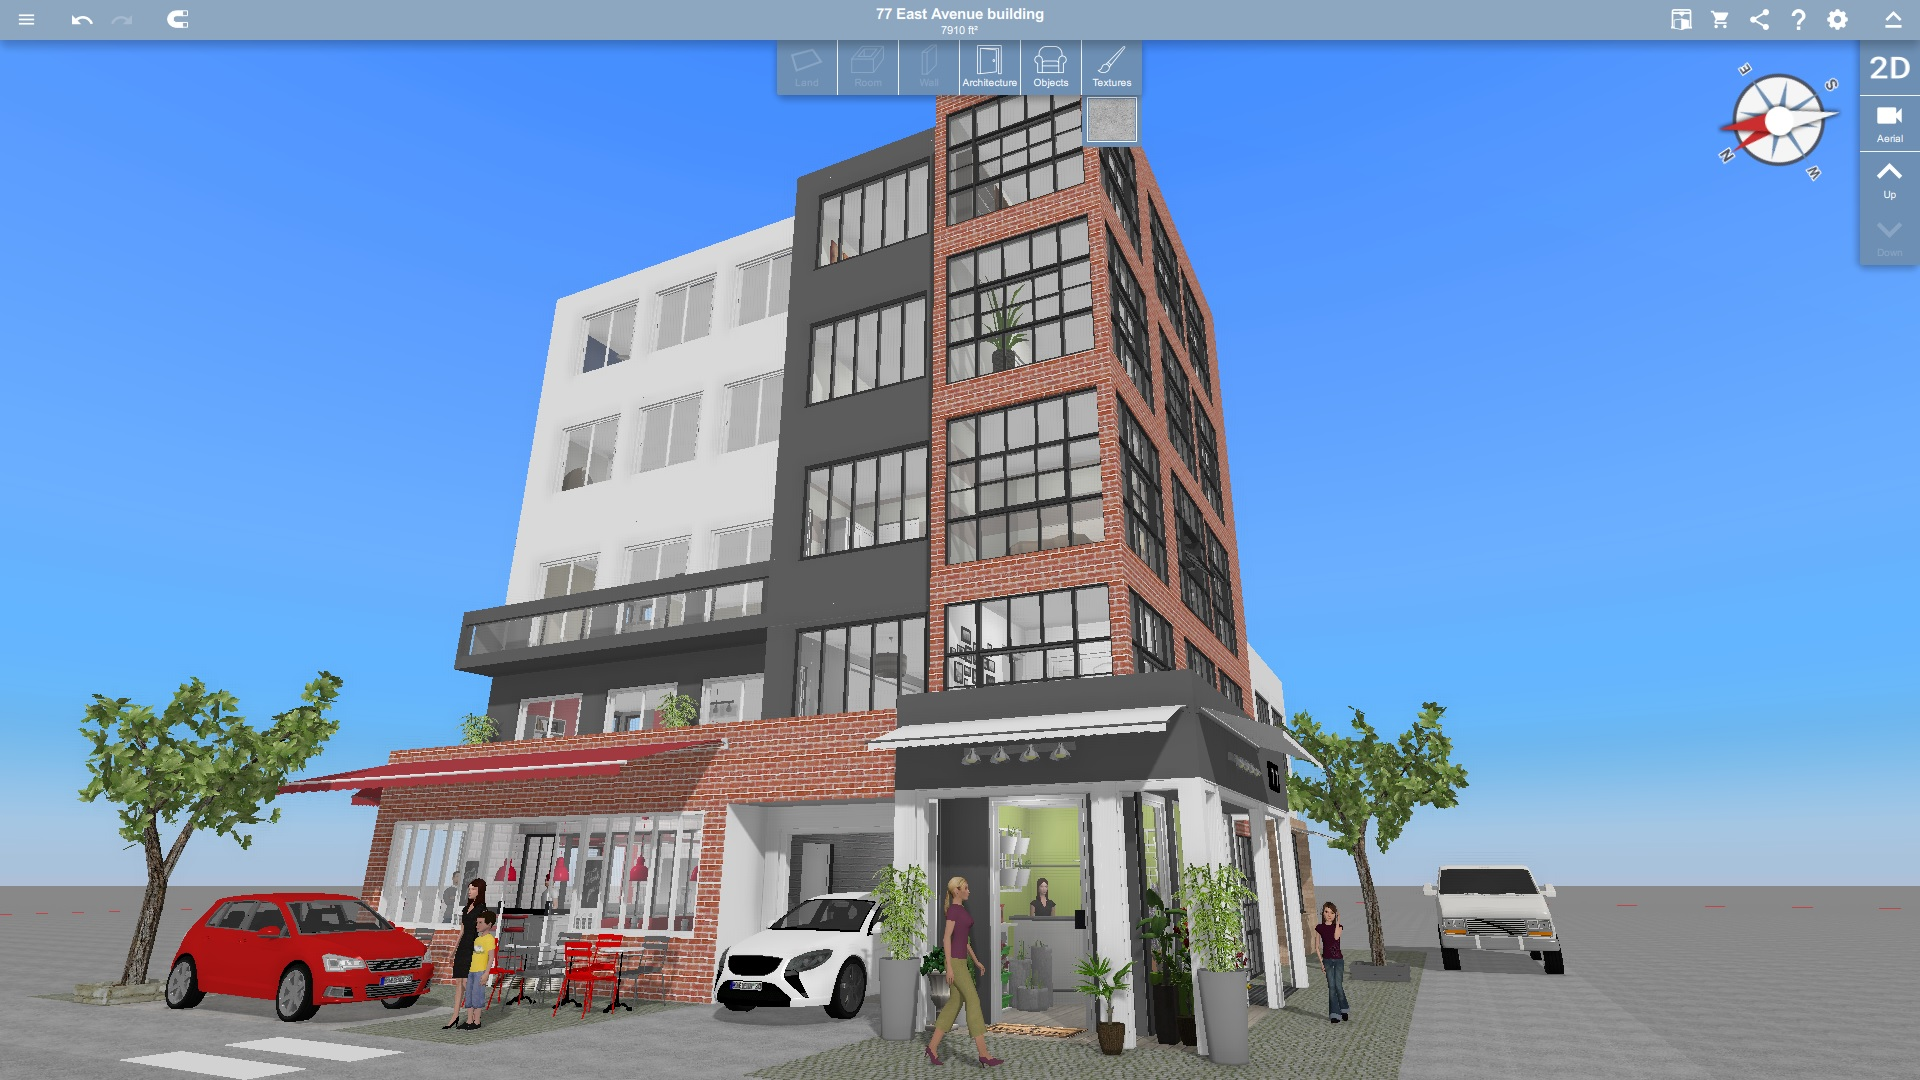 home design 3d mod apk: Home Design 3d Gold Plus Apk Download Cocosetc